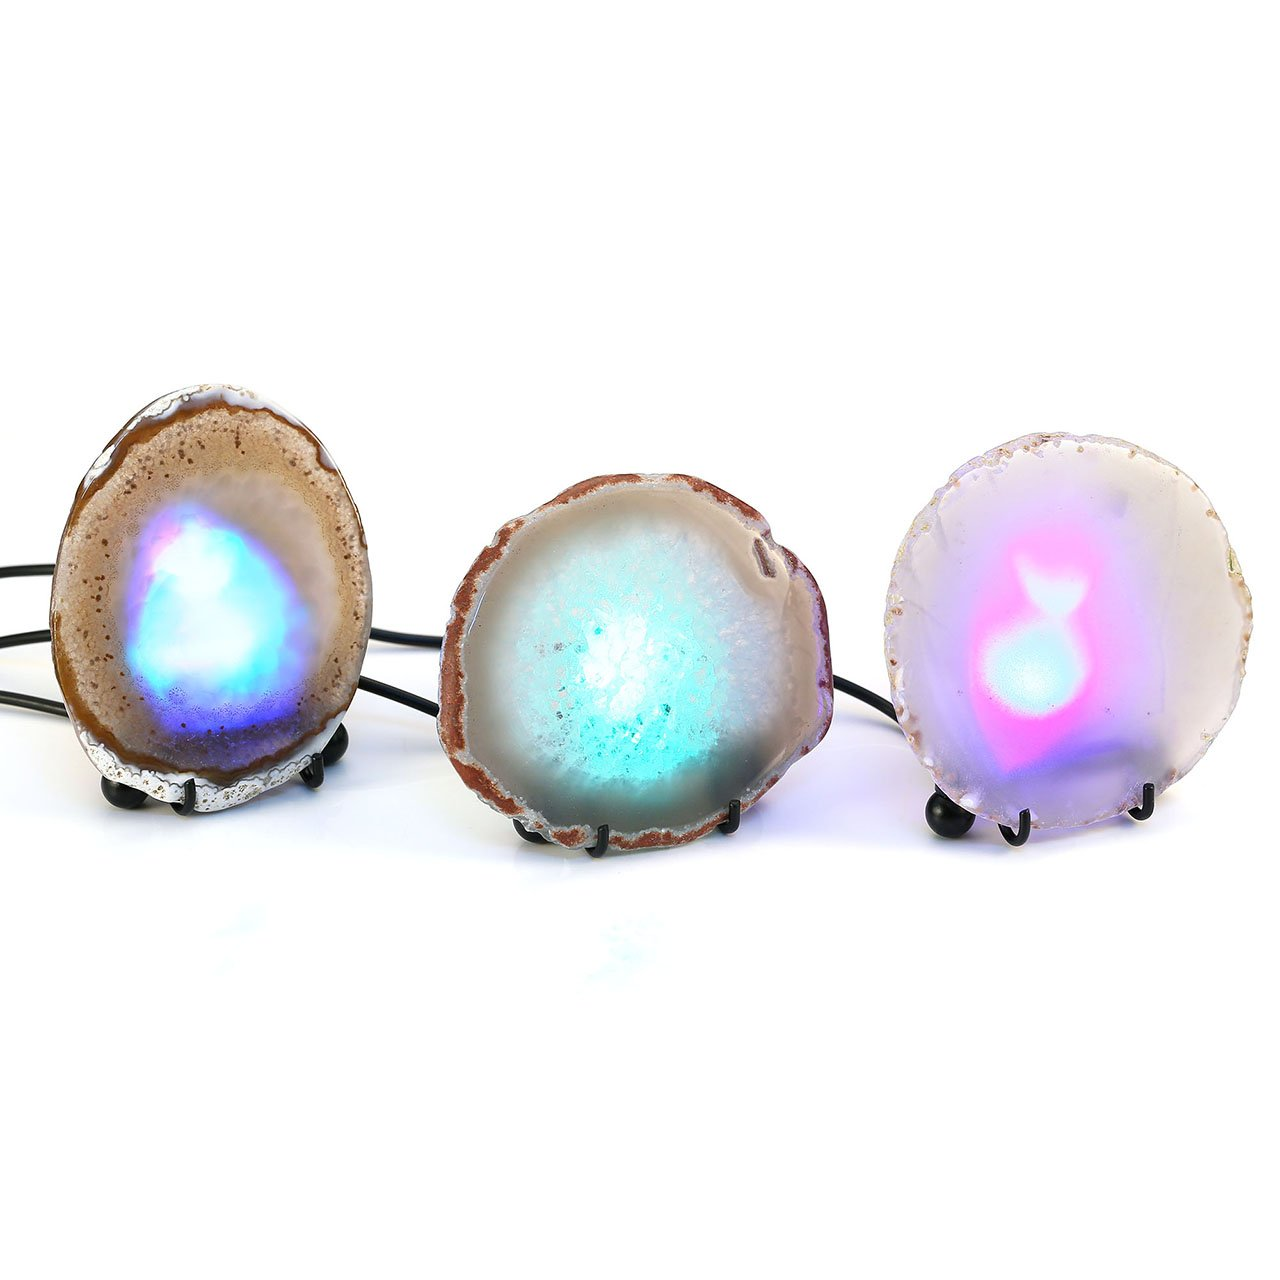 Dyed Blue Mineral Rock Geode Druzy Slice LED Night Lamp Desk Table Lamp W//USB Interface QGEM Natural Agate Slice Nightlight